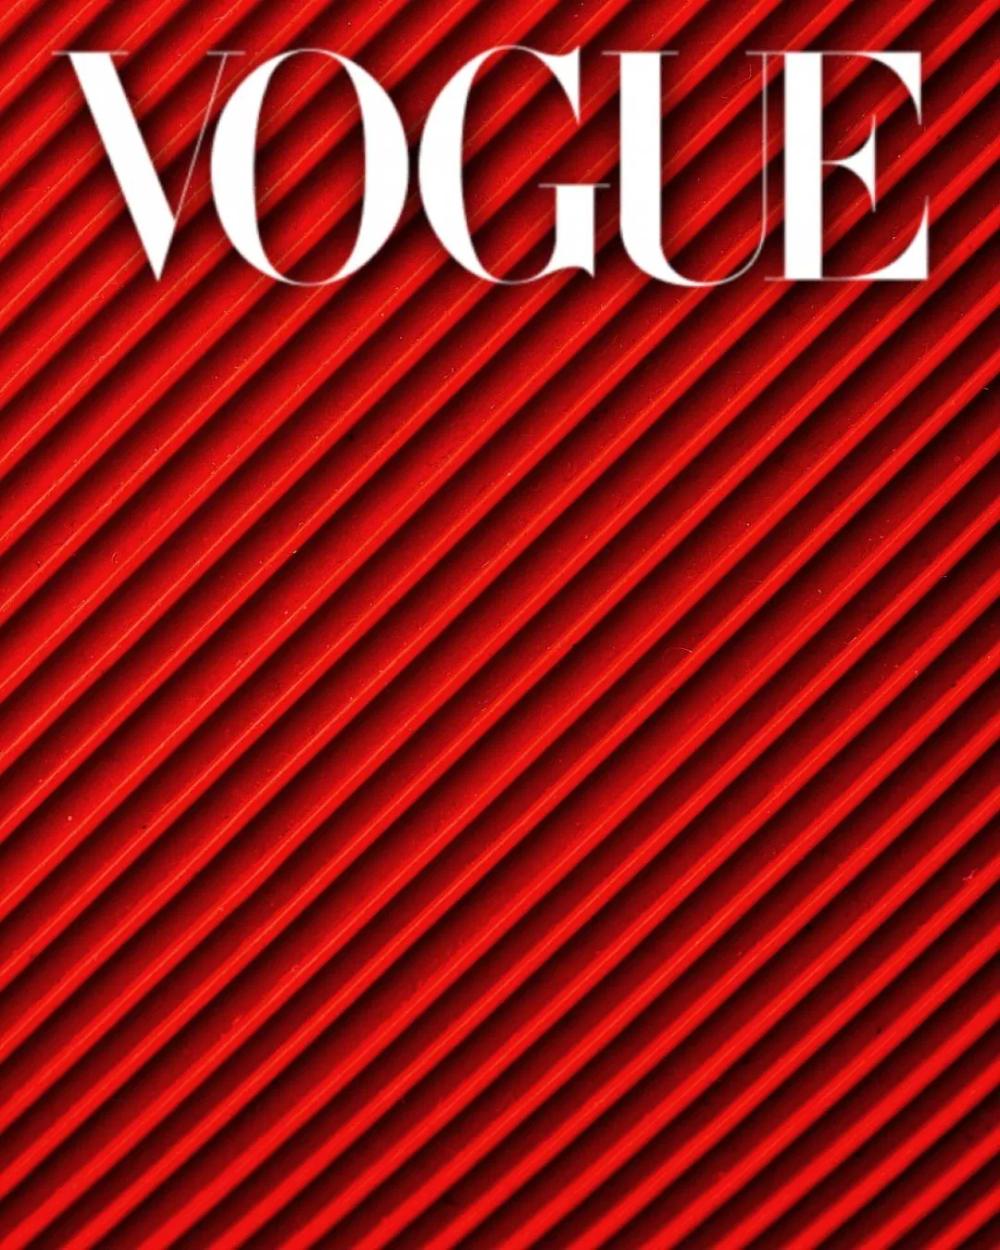 15 Best Vogue Challenge Templates Backgrounds For Tiktok Instagram Challenges Templates Youtube Design